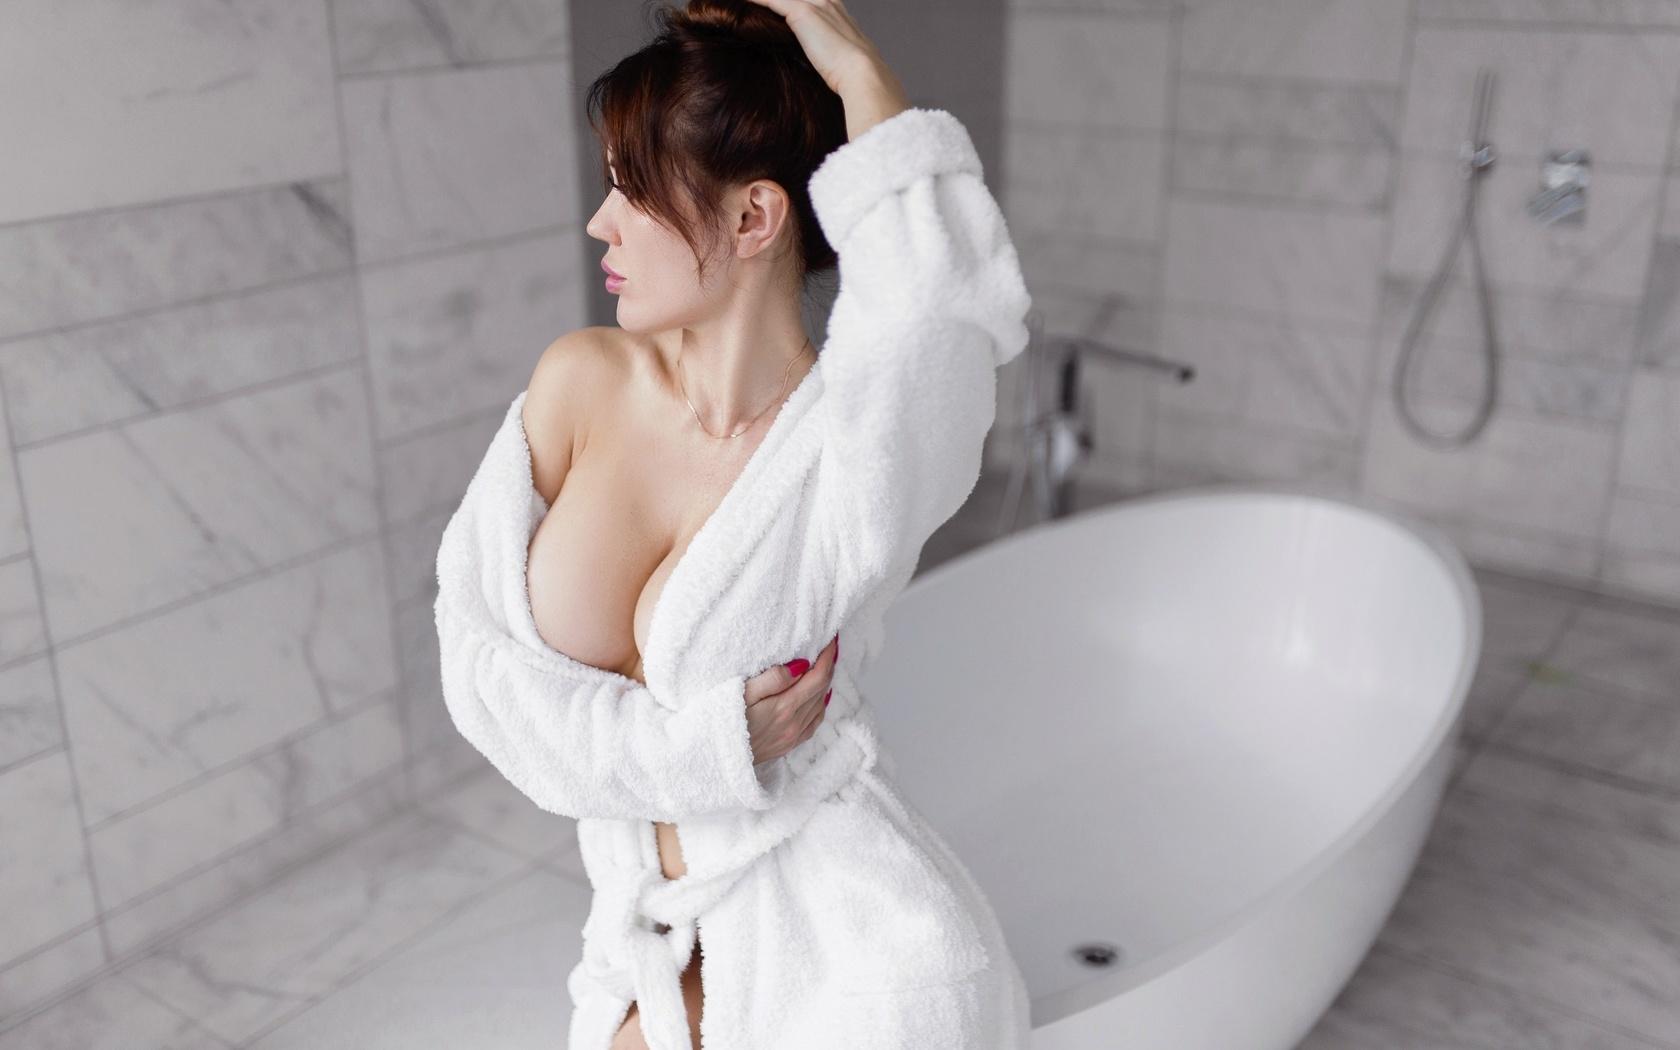 anzhelika ivanova, халат, ванная